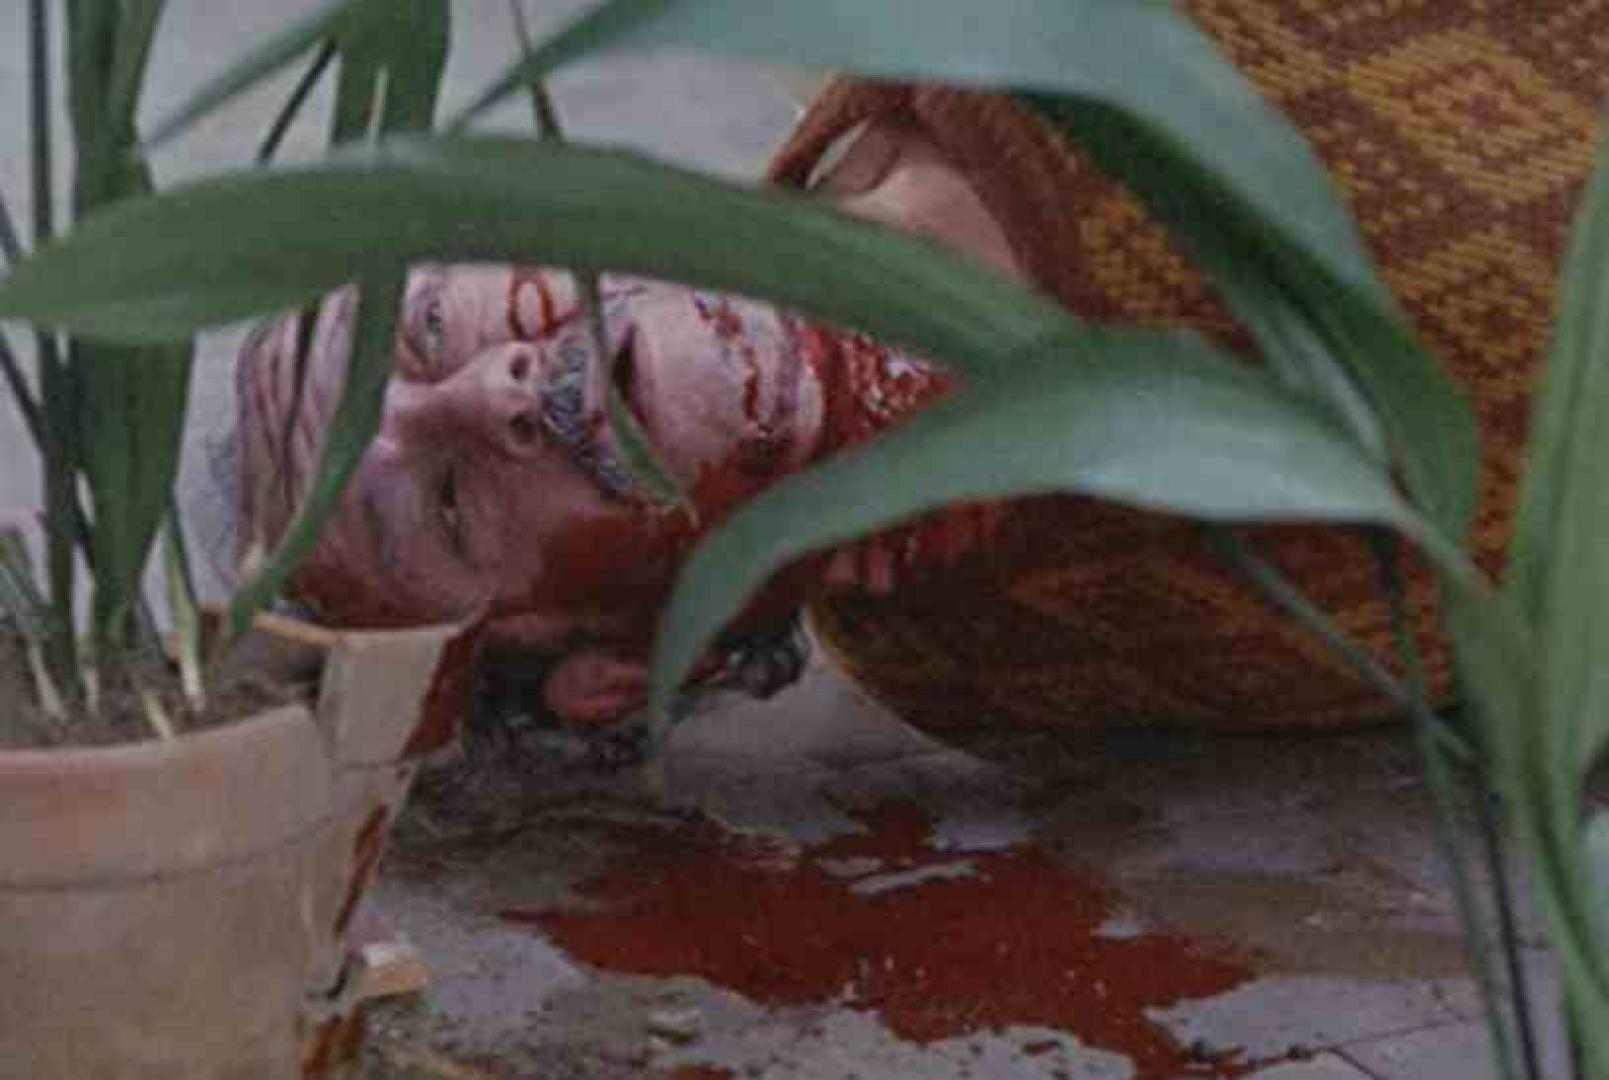 Suor Omicidi - A gyilkos apáca (1979) 2. kép